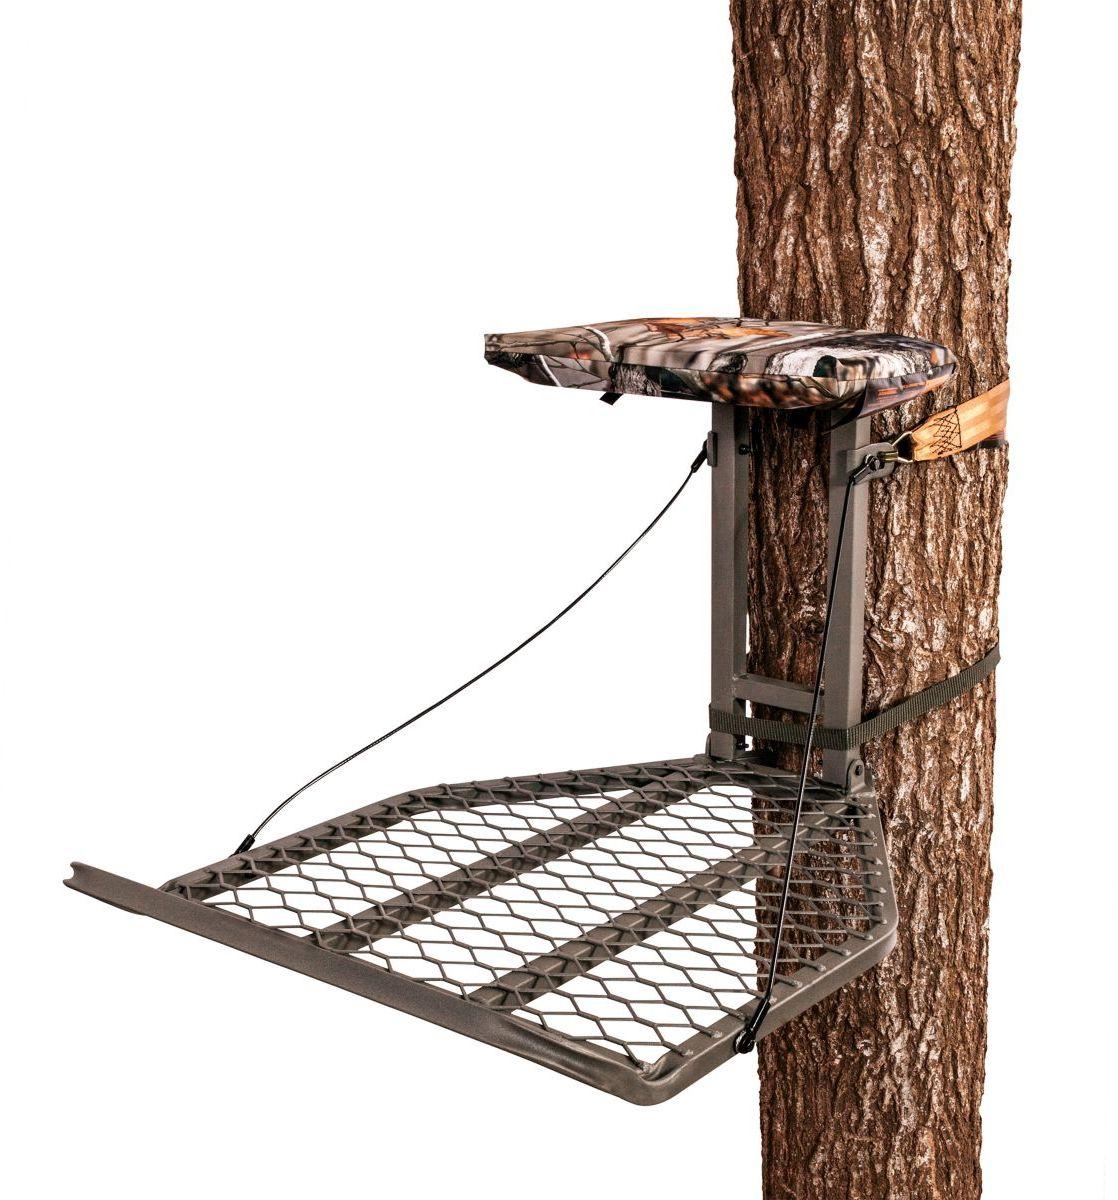 Summit Treestands Ledge Hang-On Treestand